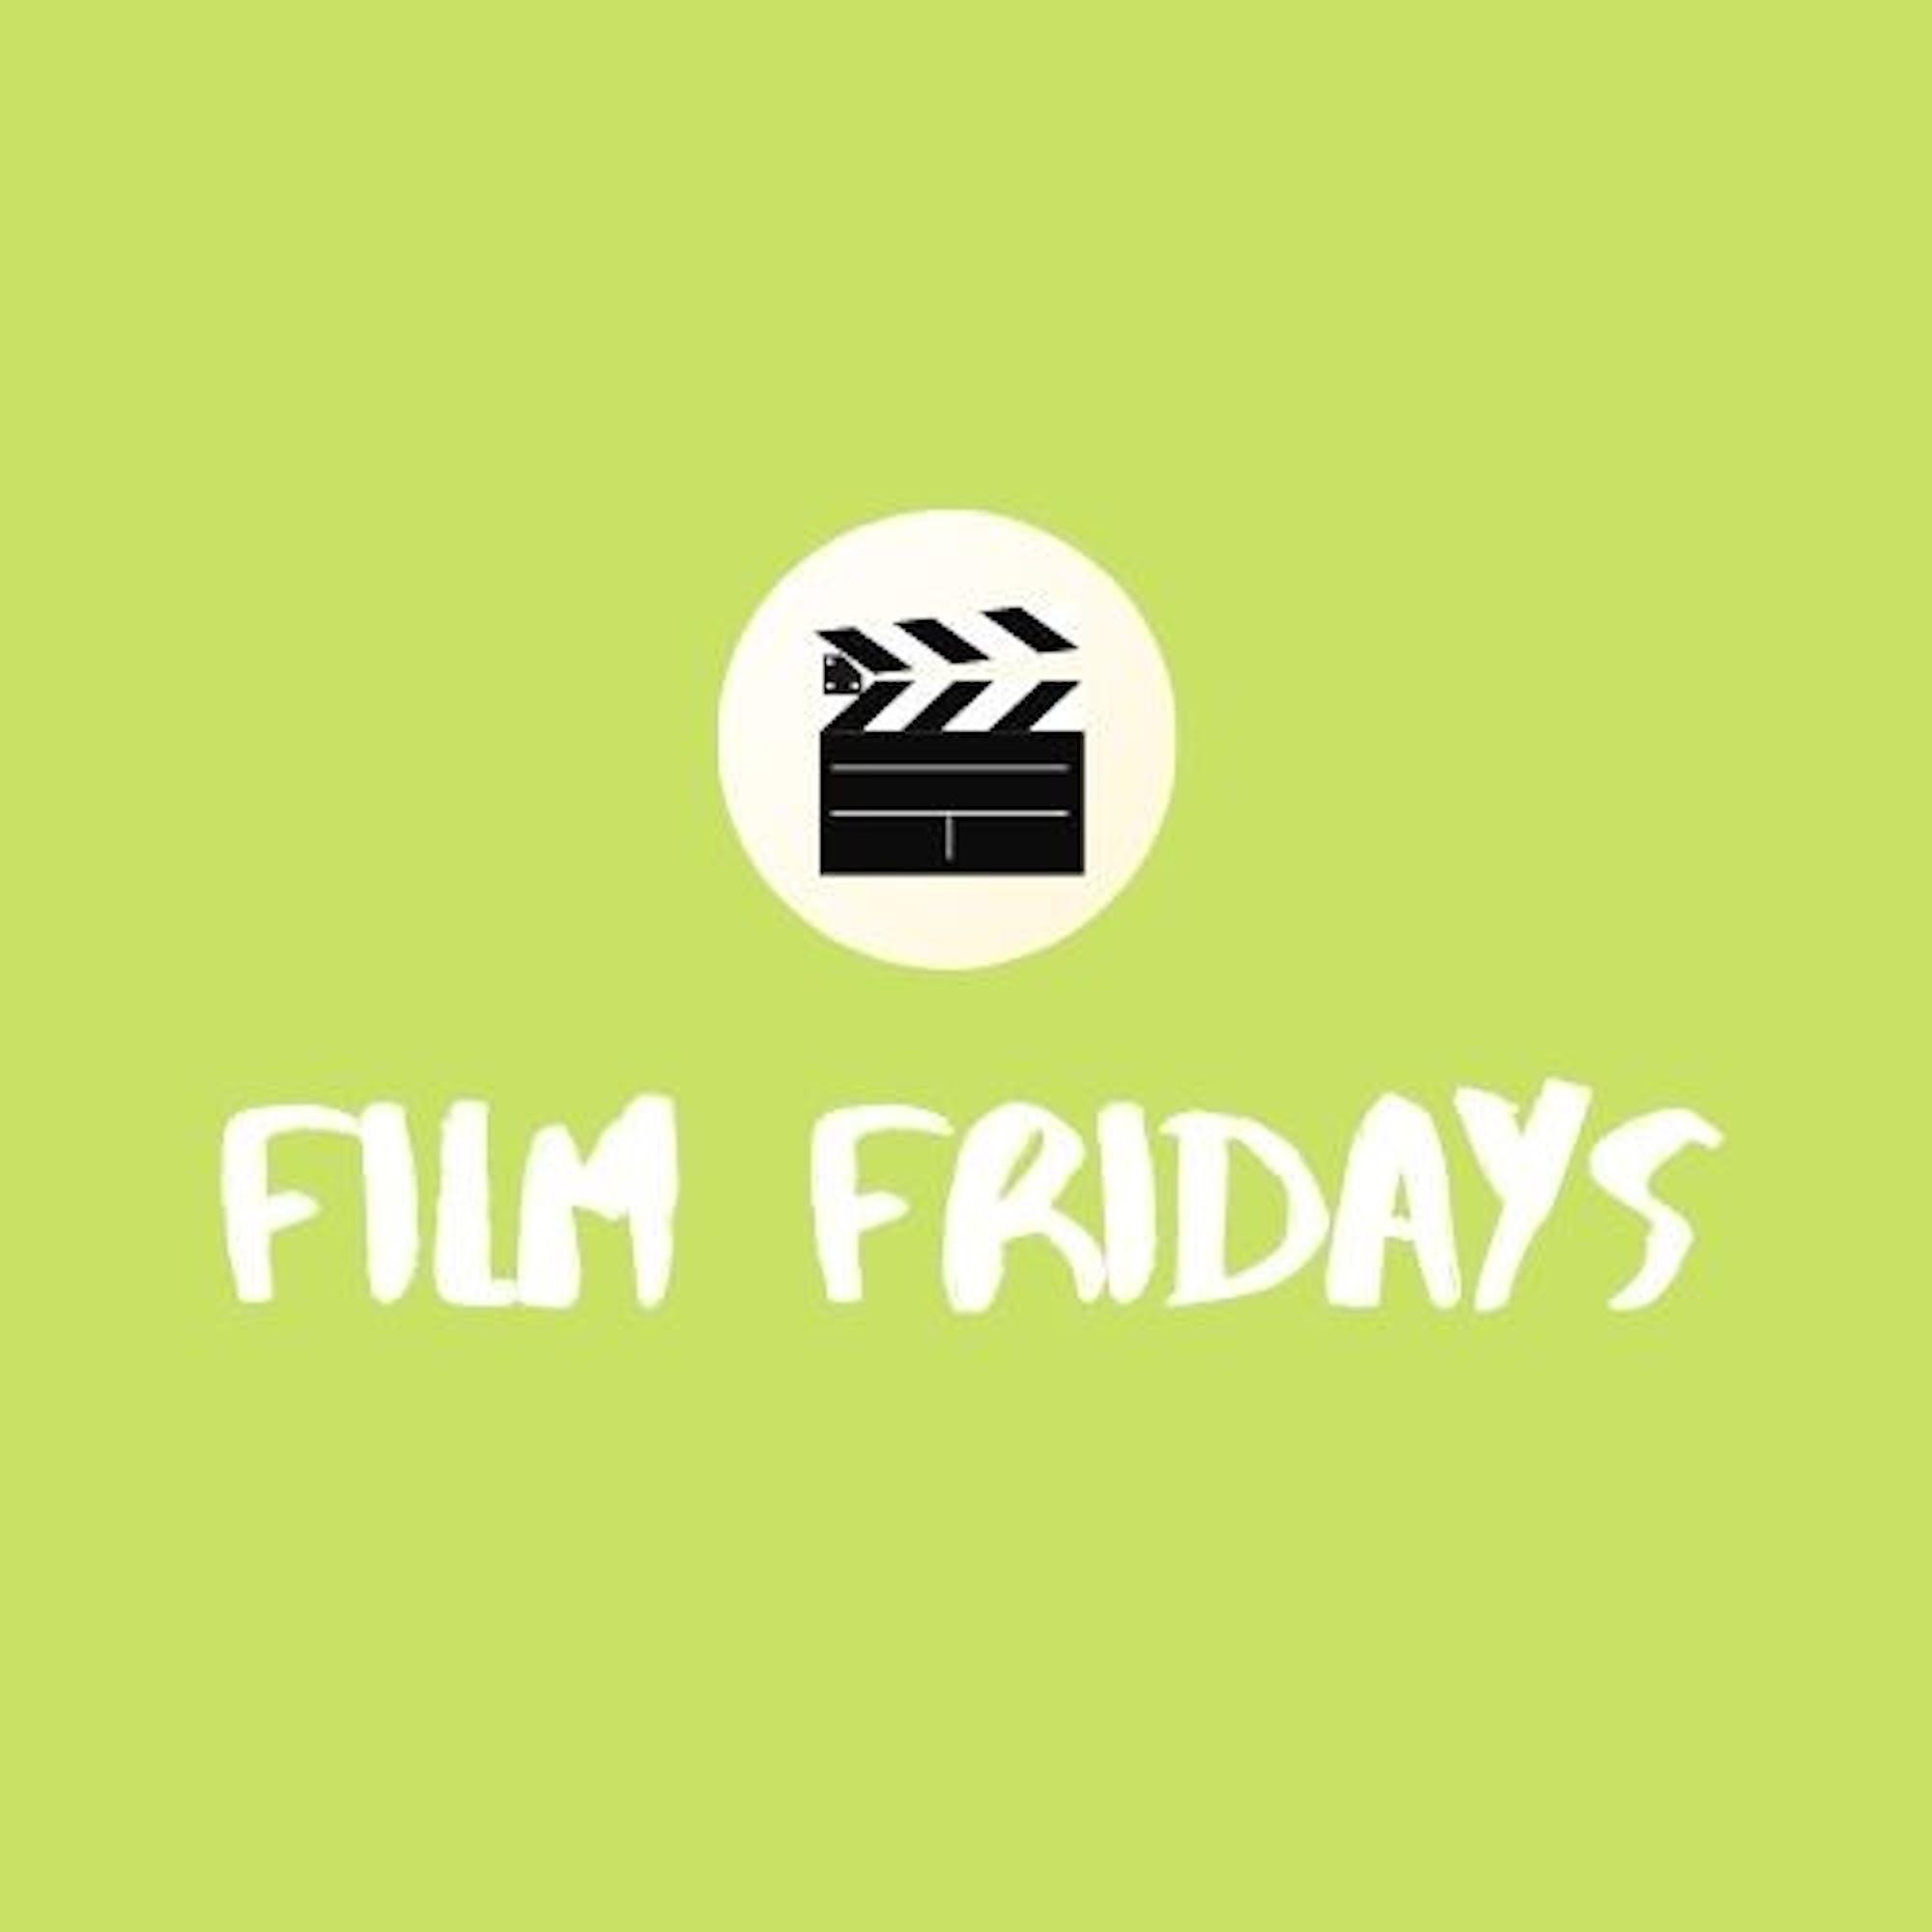 film-fridays